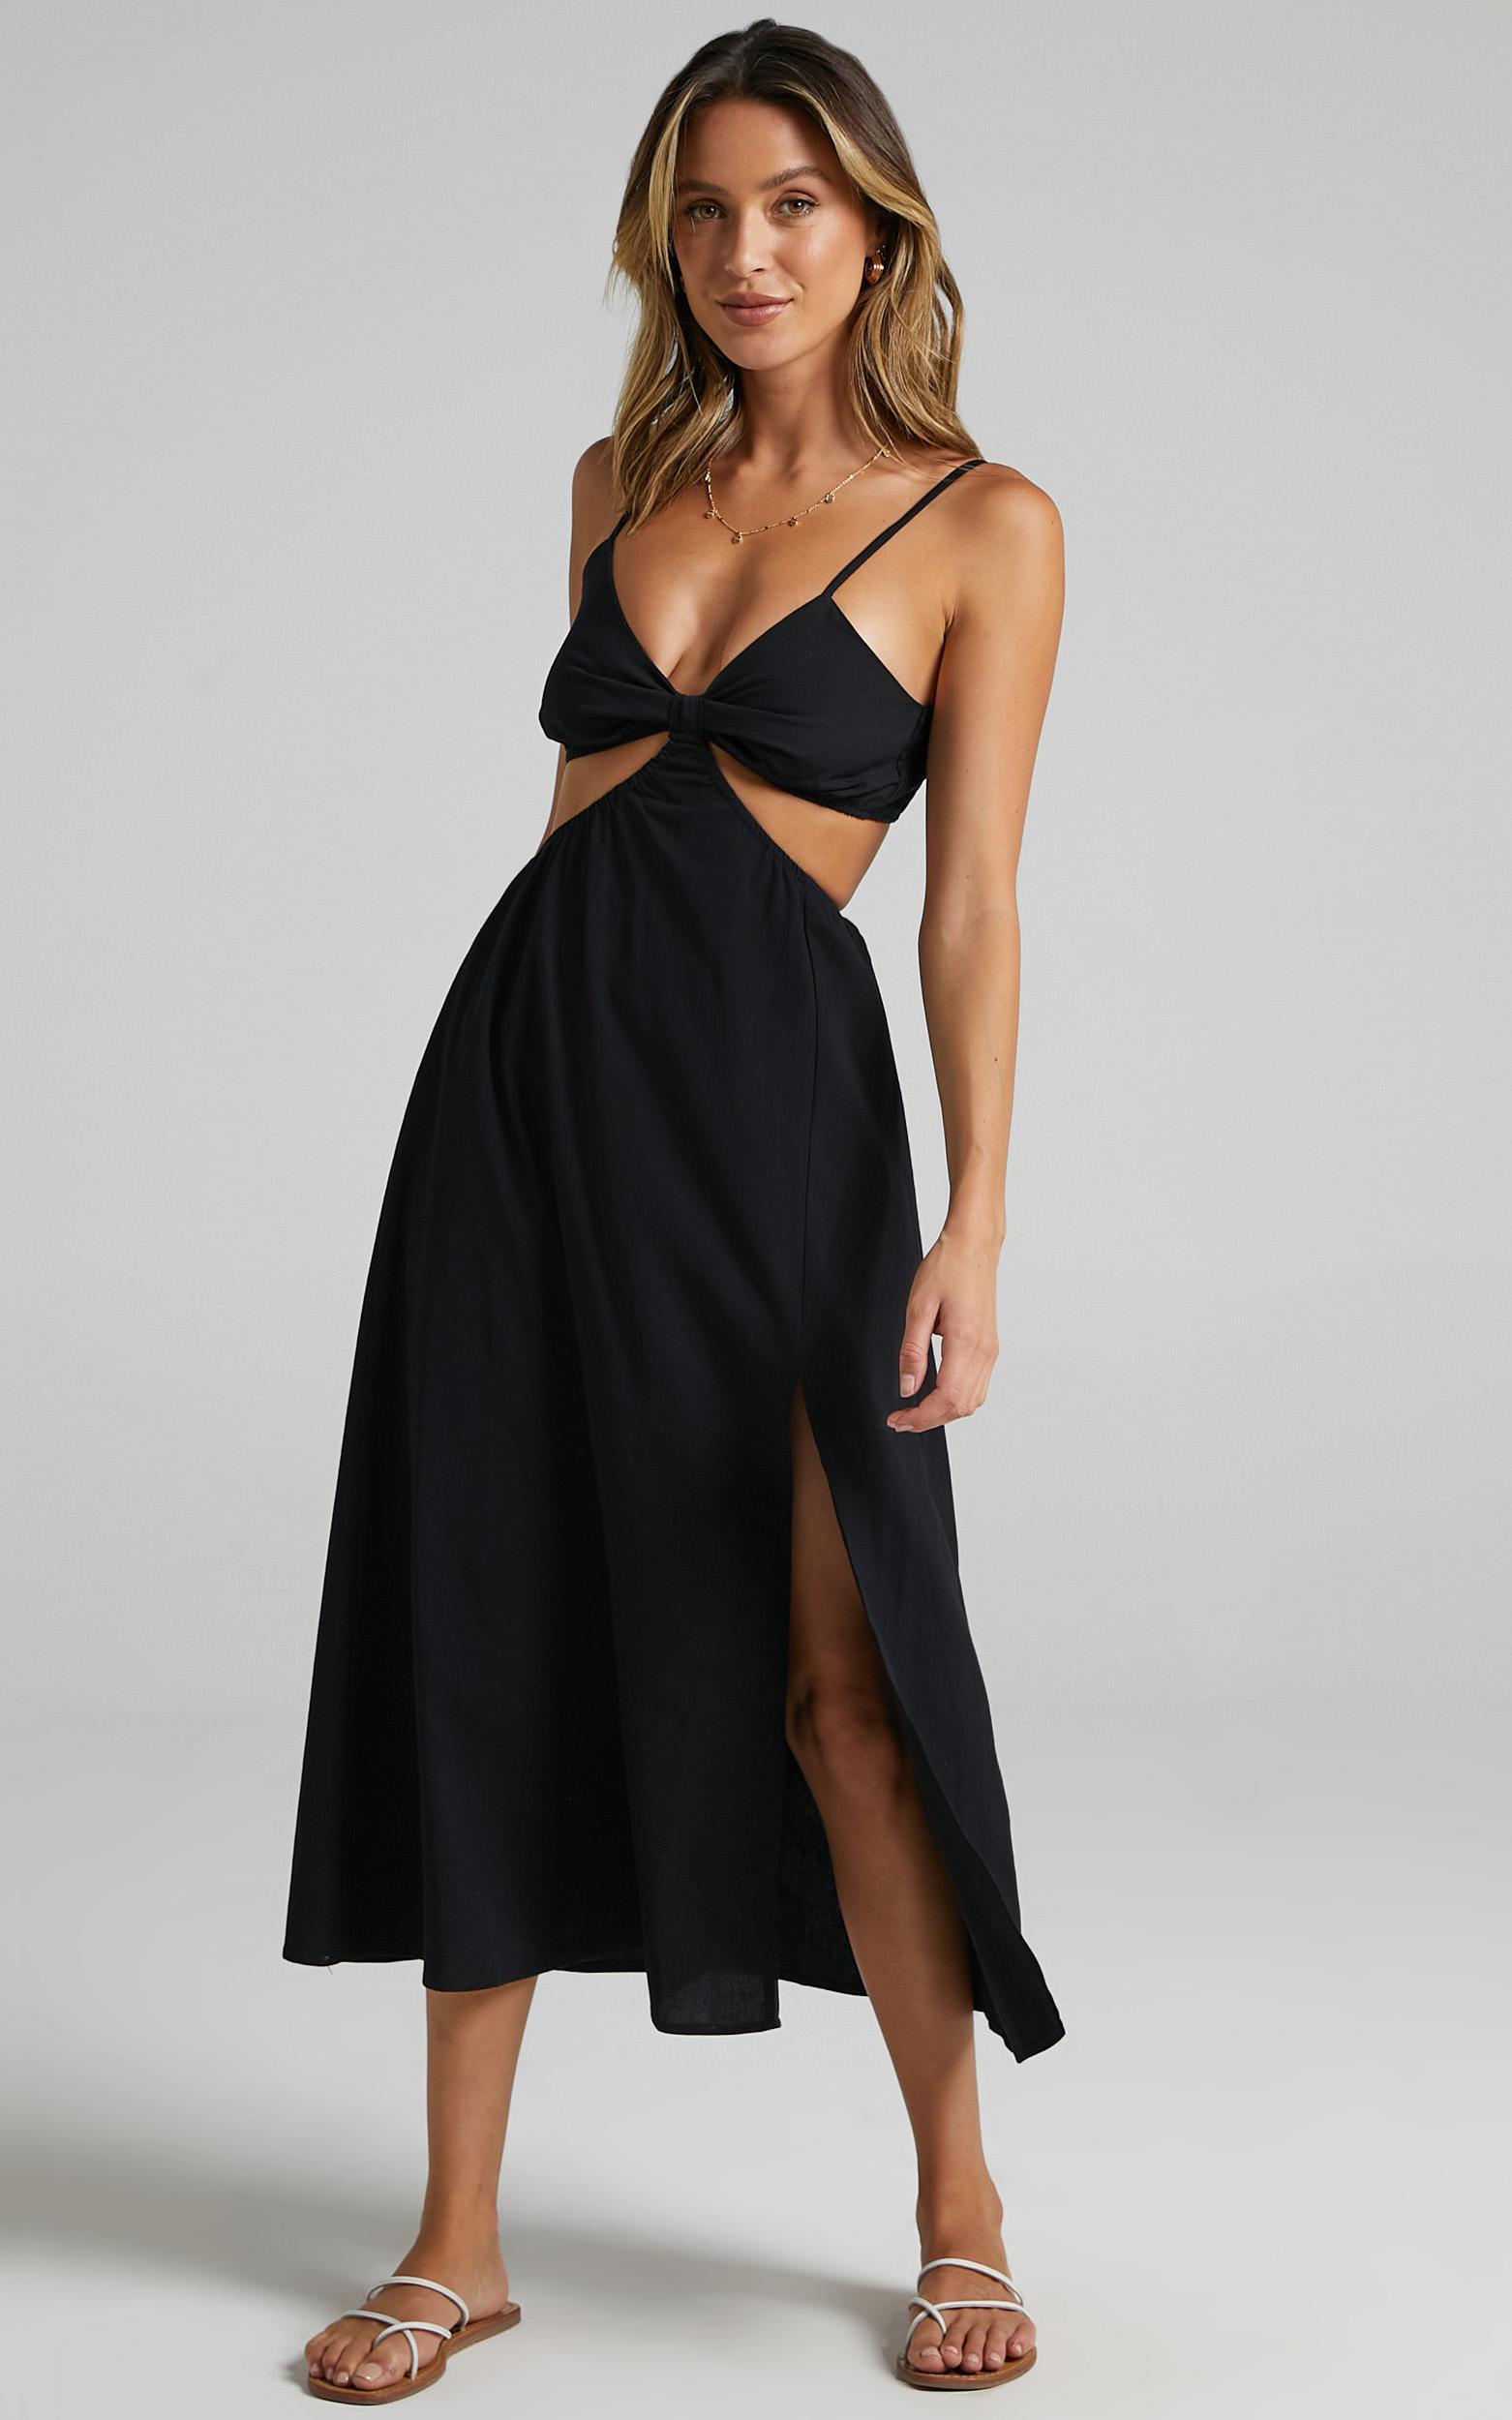 Melyssa Dress in Black - 6 (XS), Black, hi-res image number null